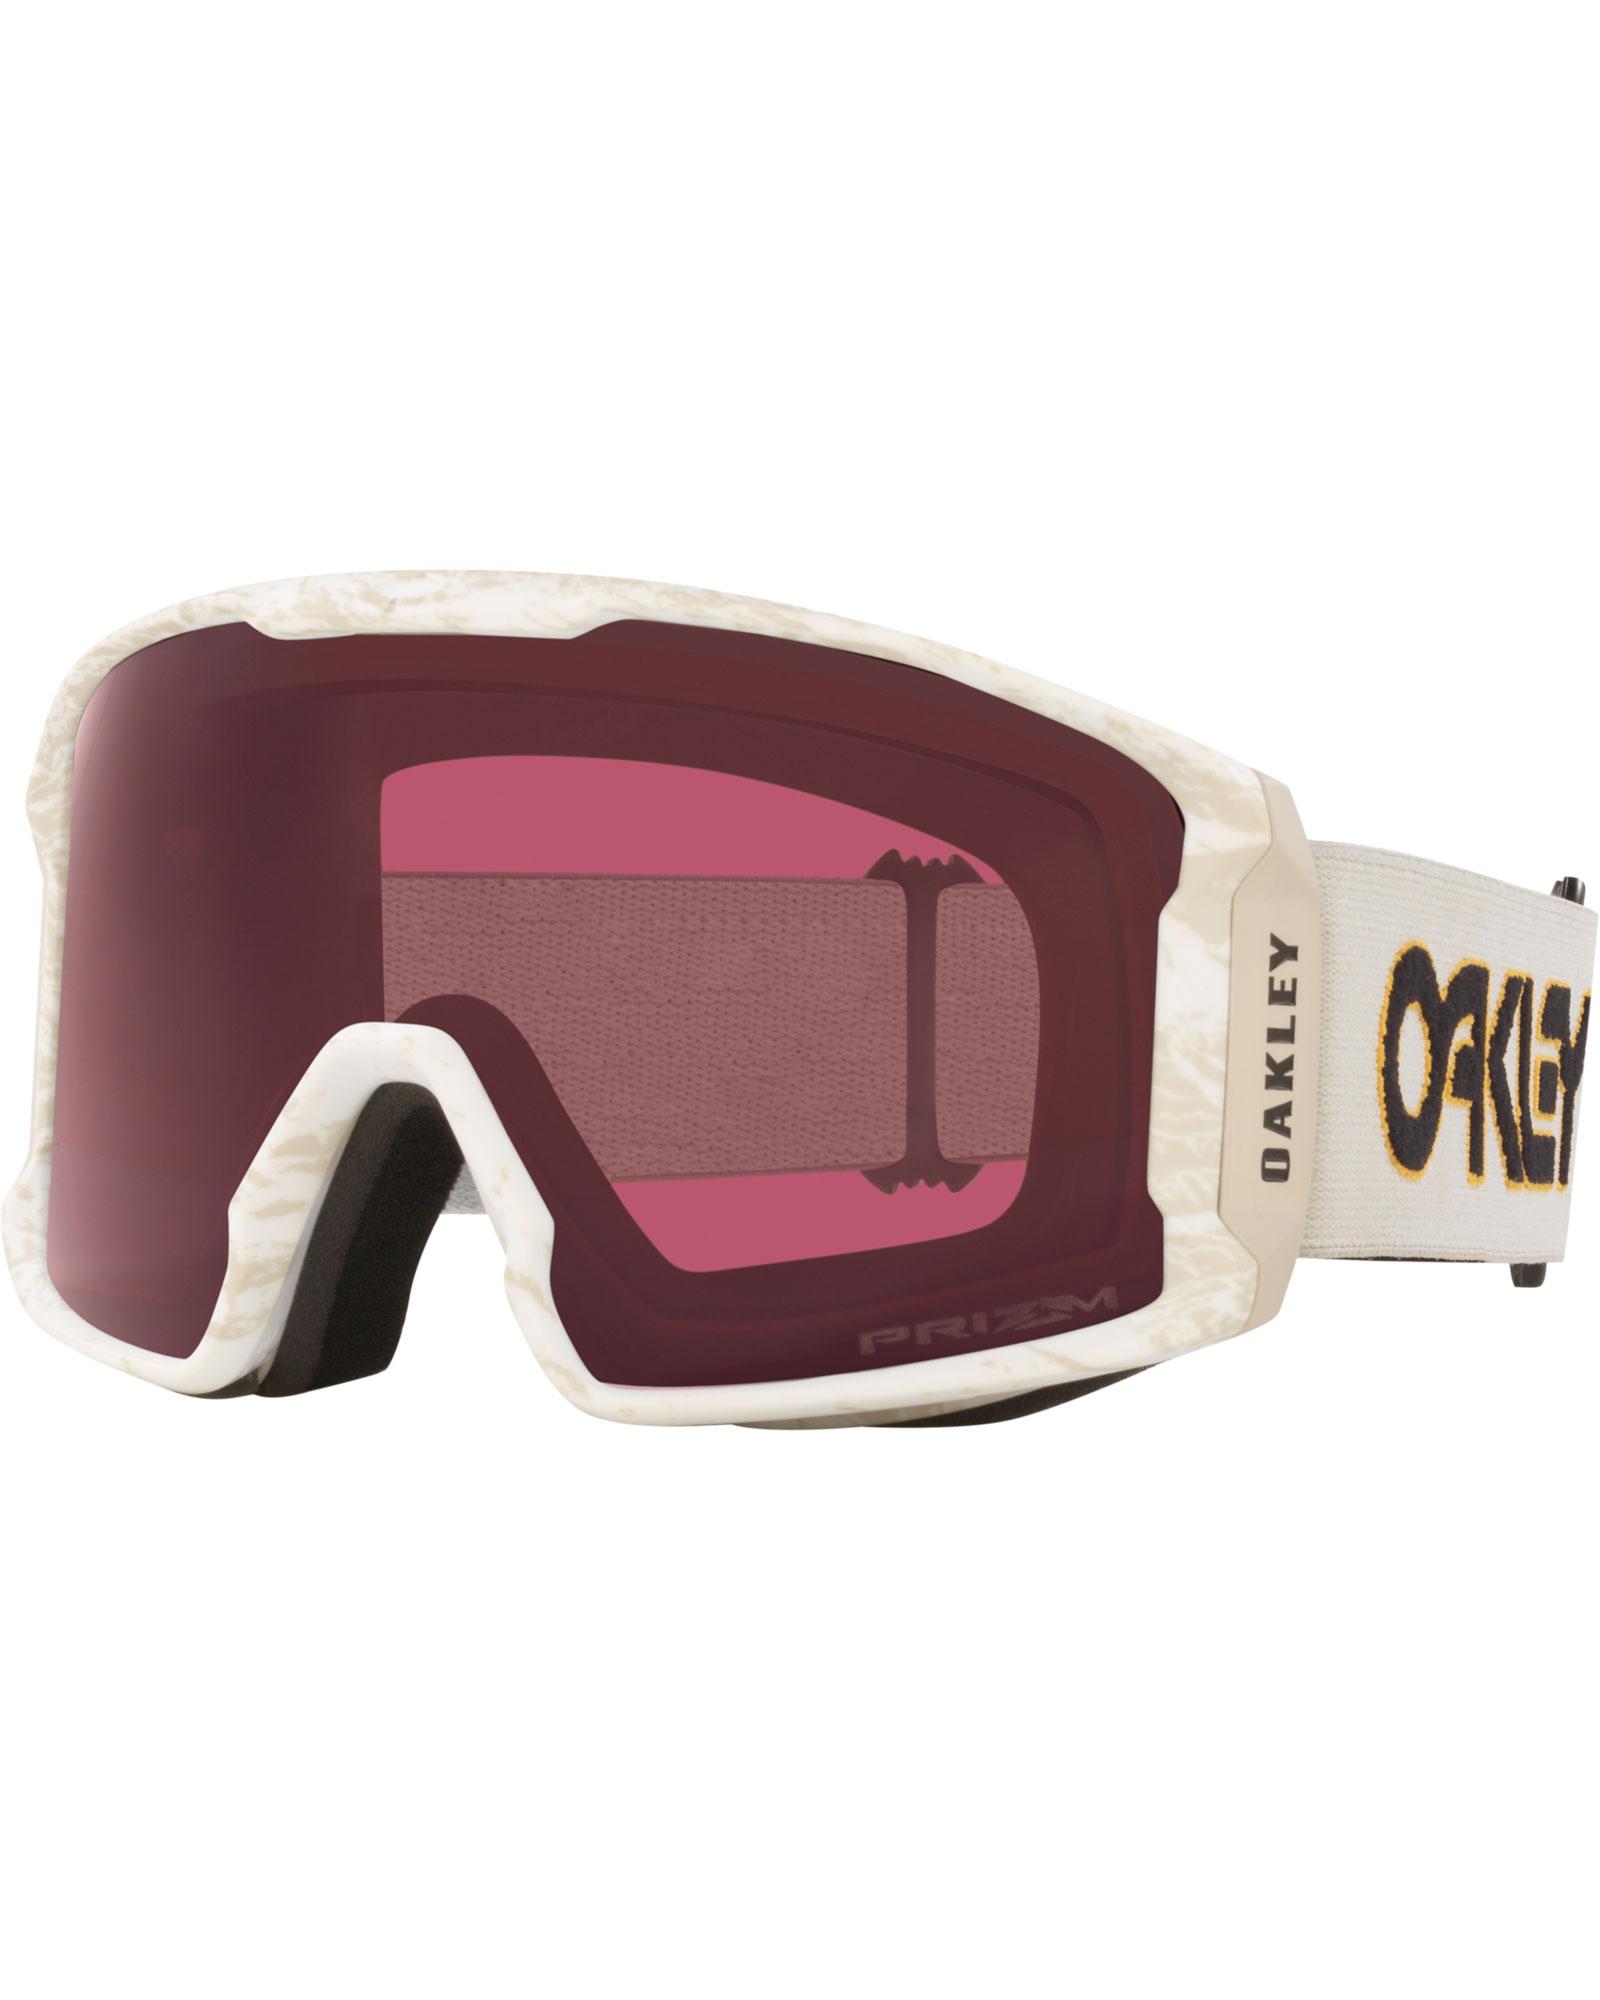 Oakley Line Miner XL Stale SIG Lunar Rock / Prizm Dark Grey Goggles 2020 / 2021 0